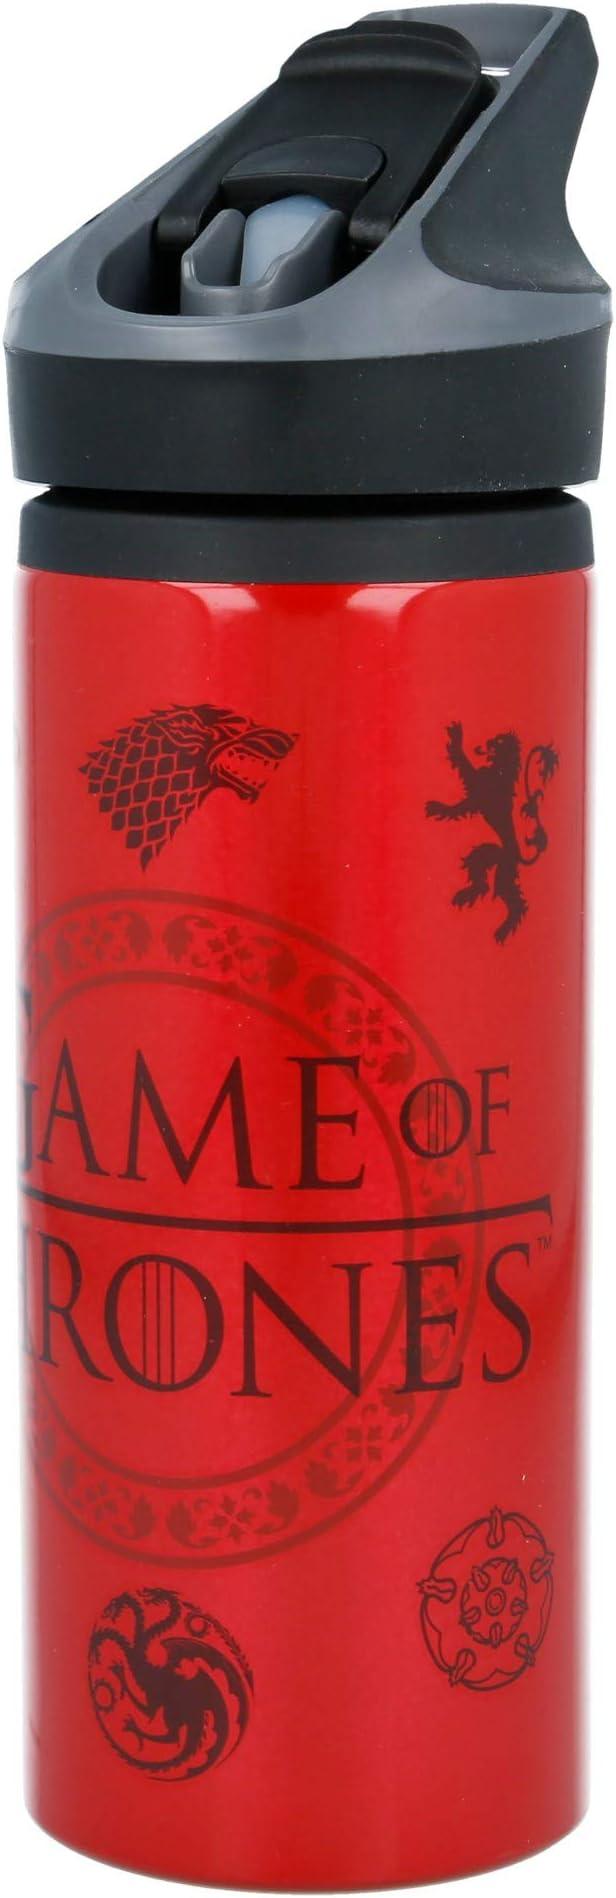 Stor Botella Aluminio Premium 710 ML | Juego DE Tronos: Amazon.es ...